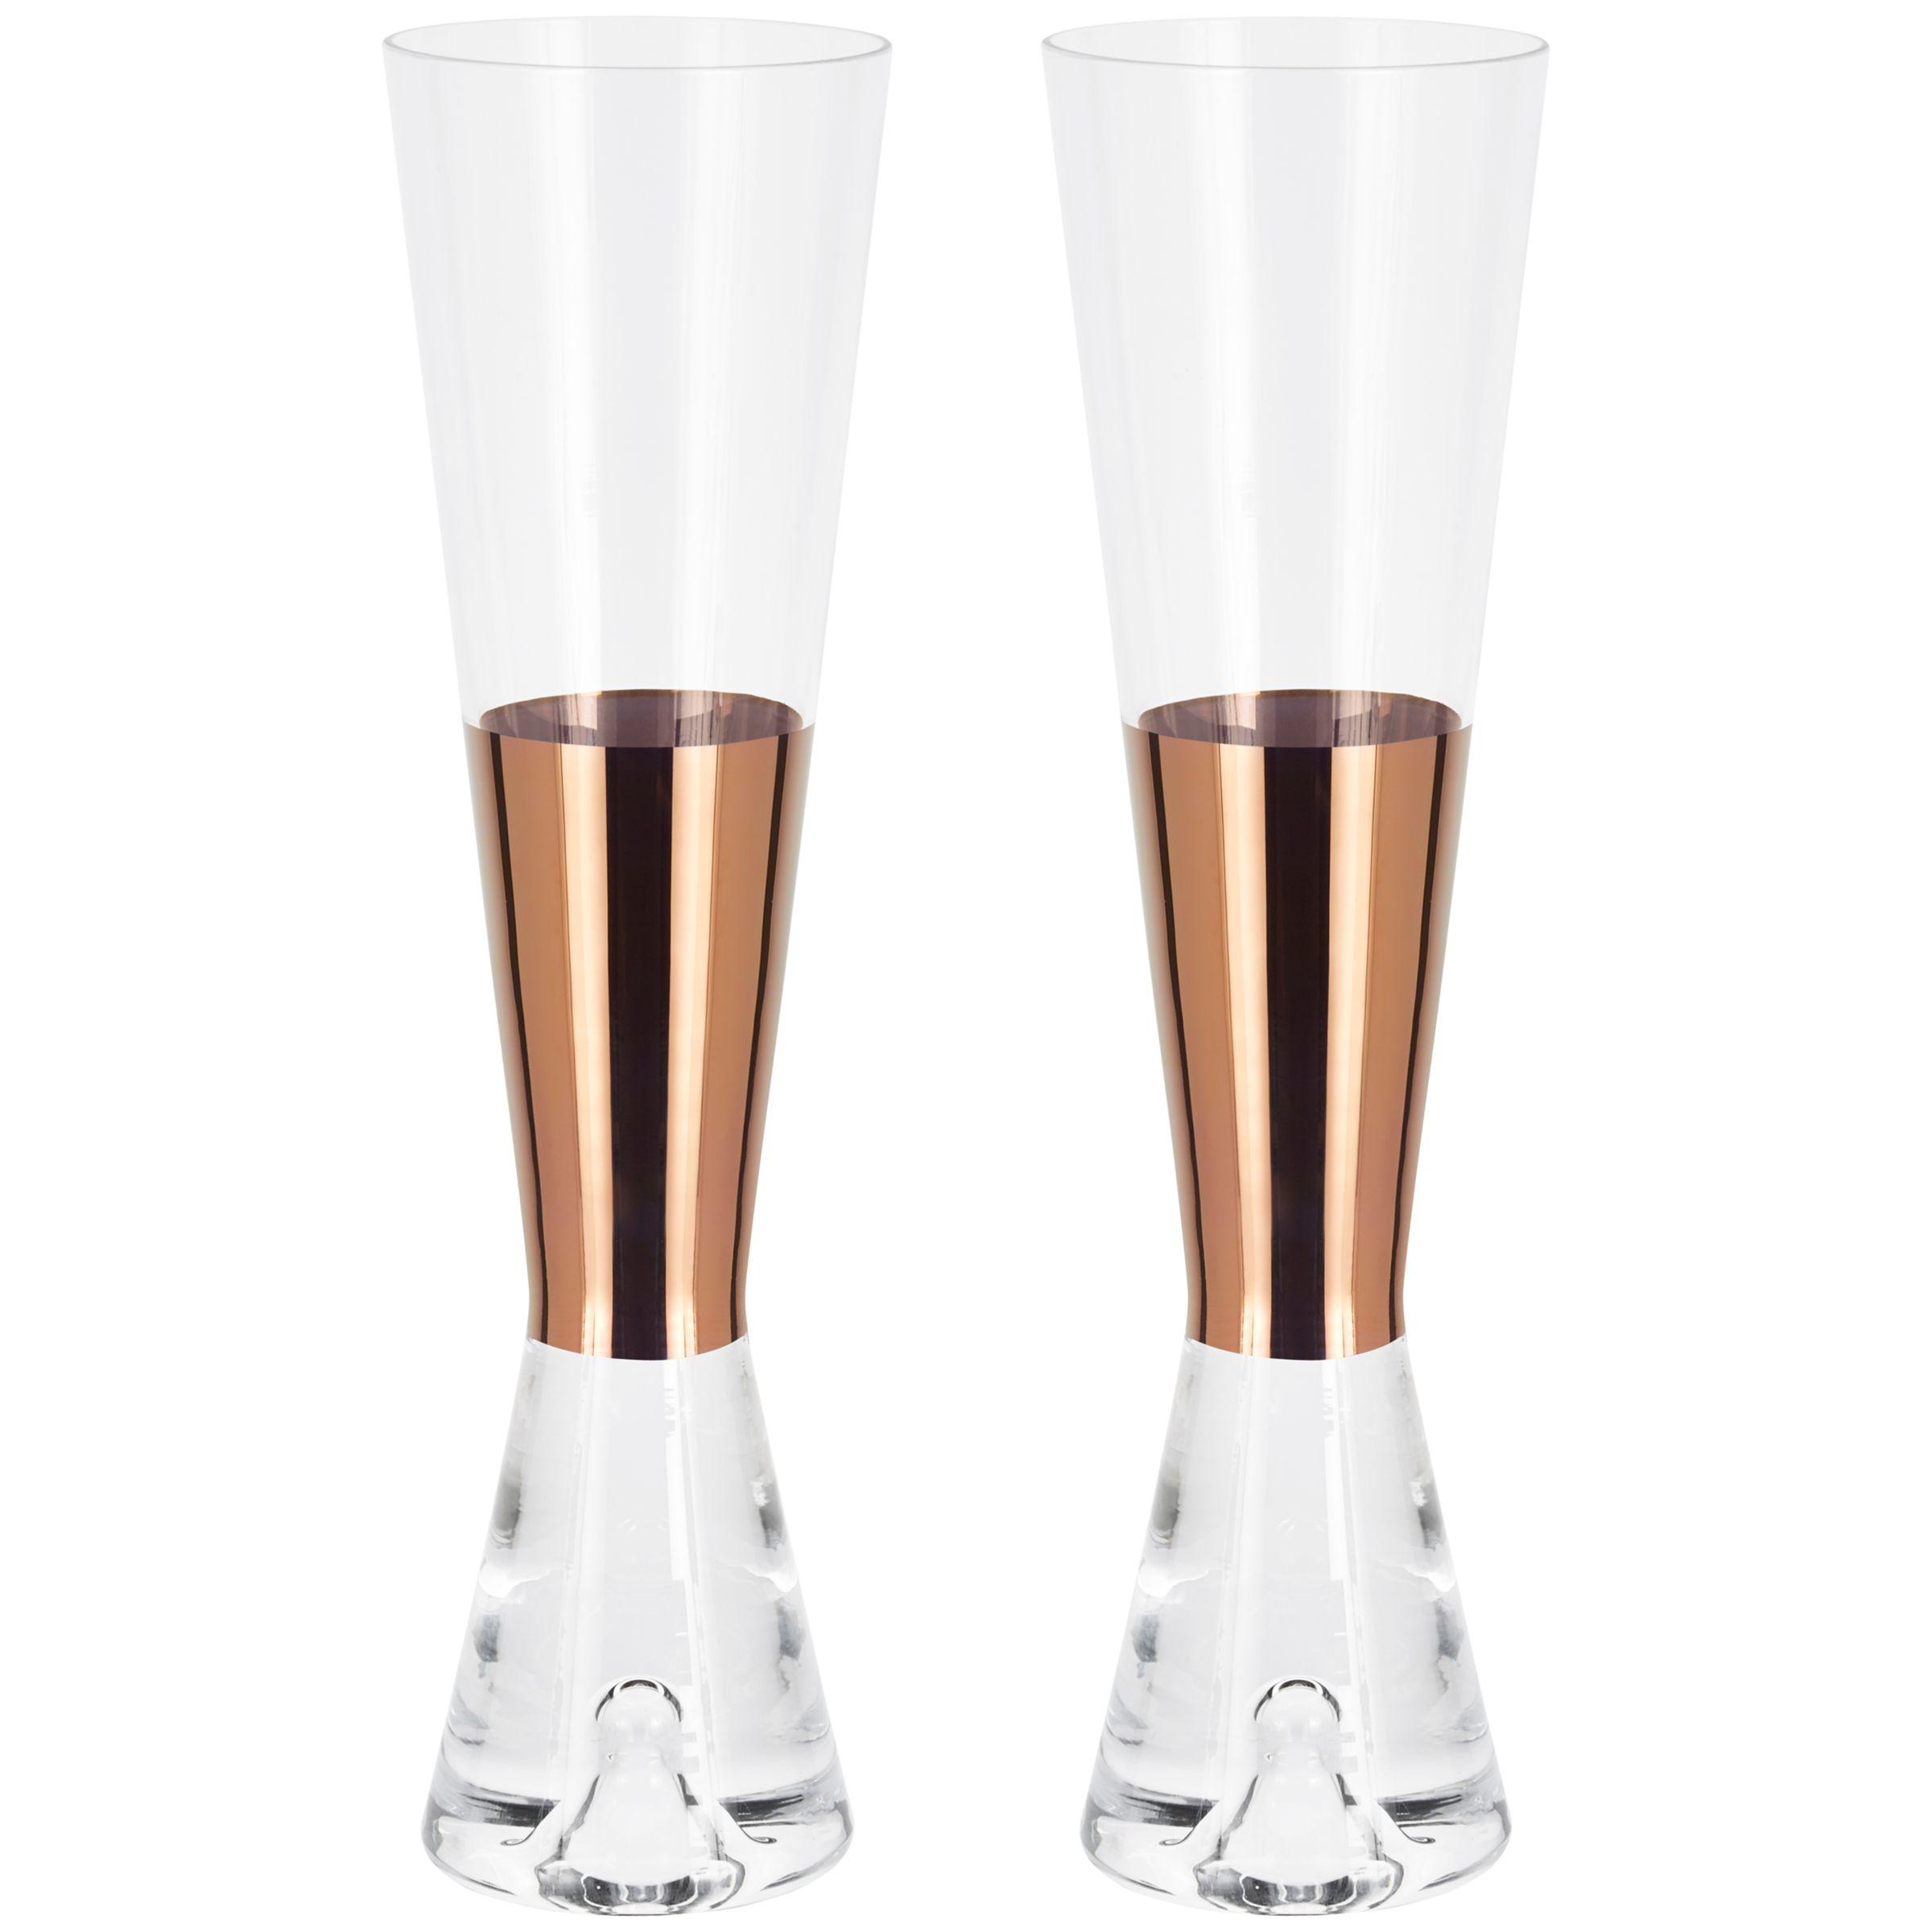 Tom Dixon Tom Dixon Tank Champagne Glasses, Set of 2